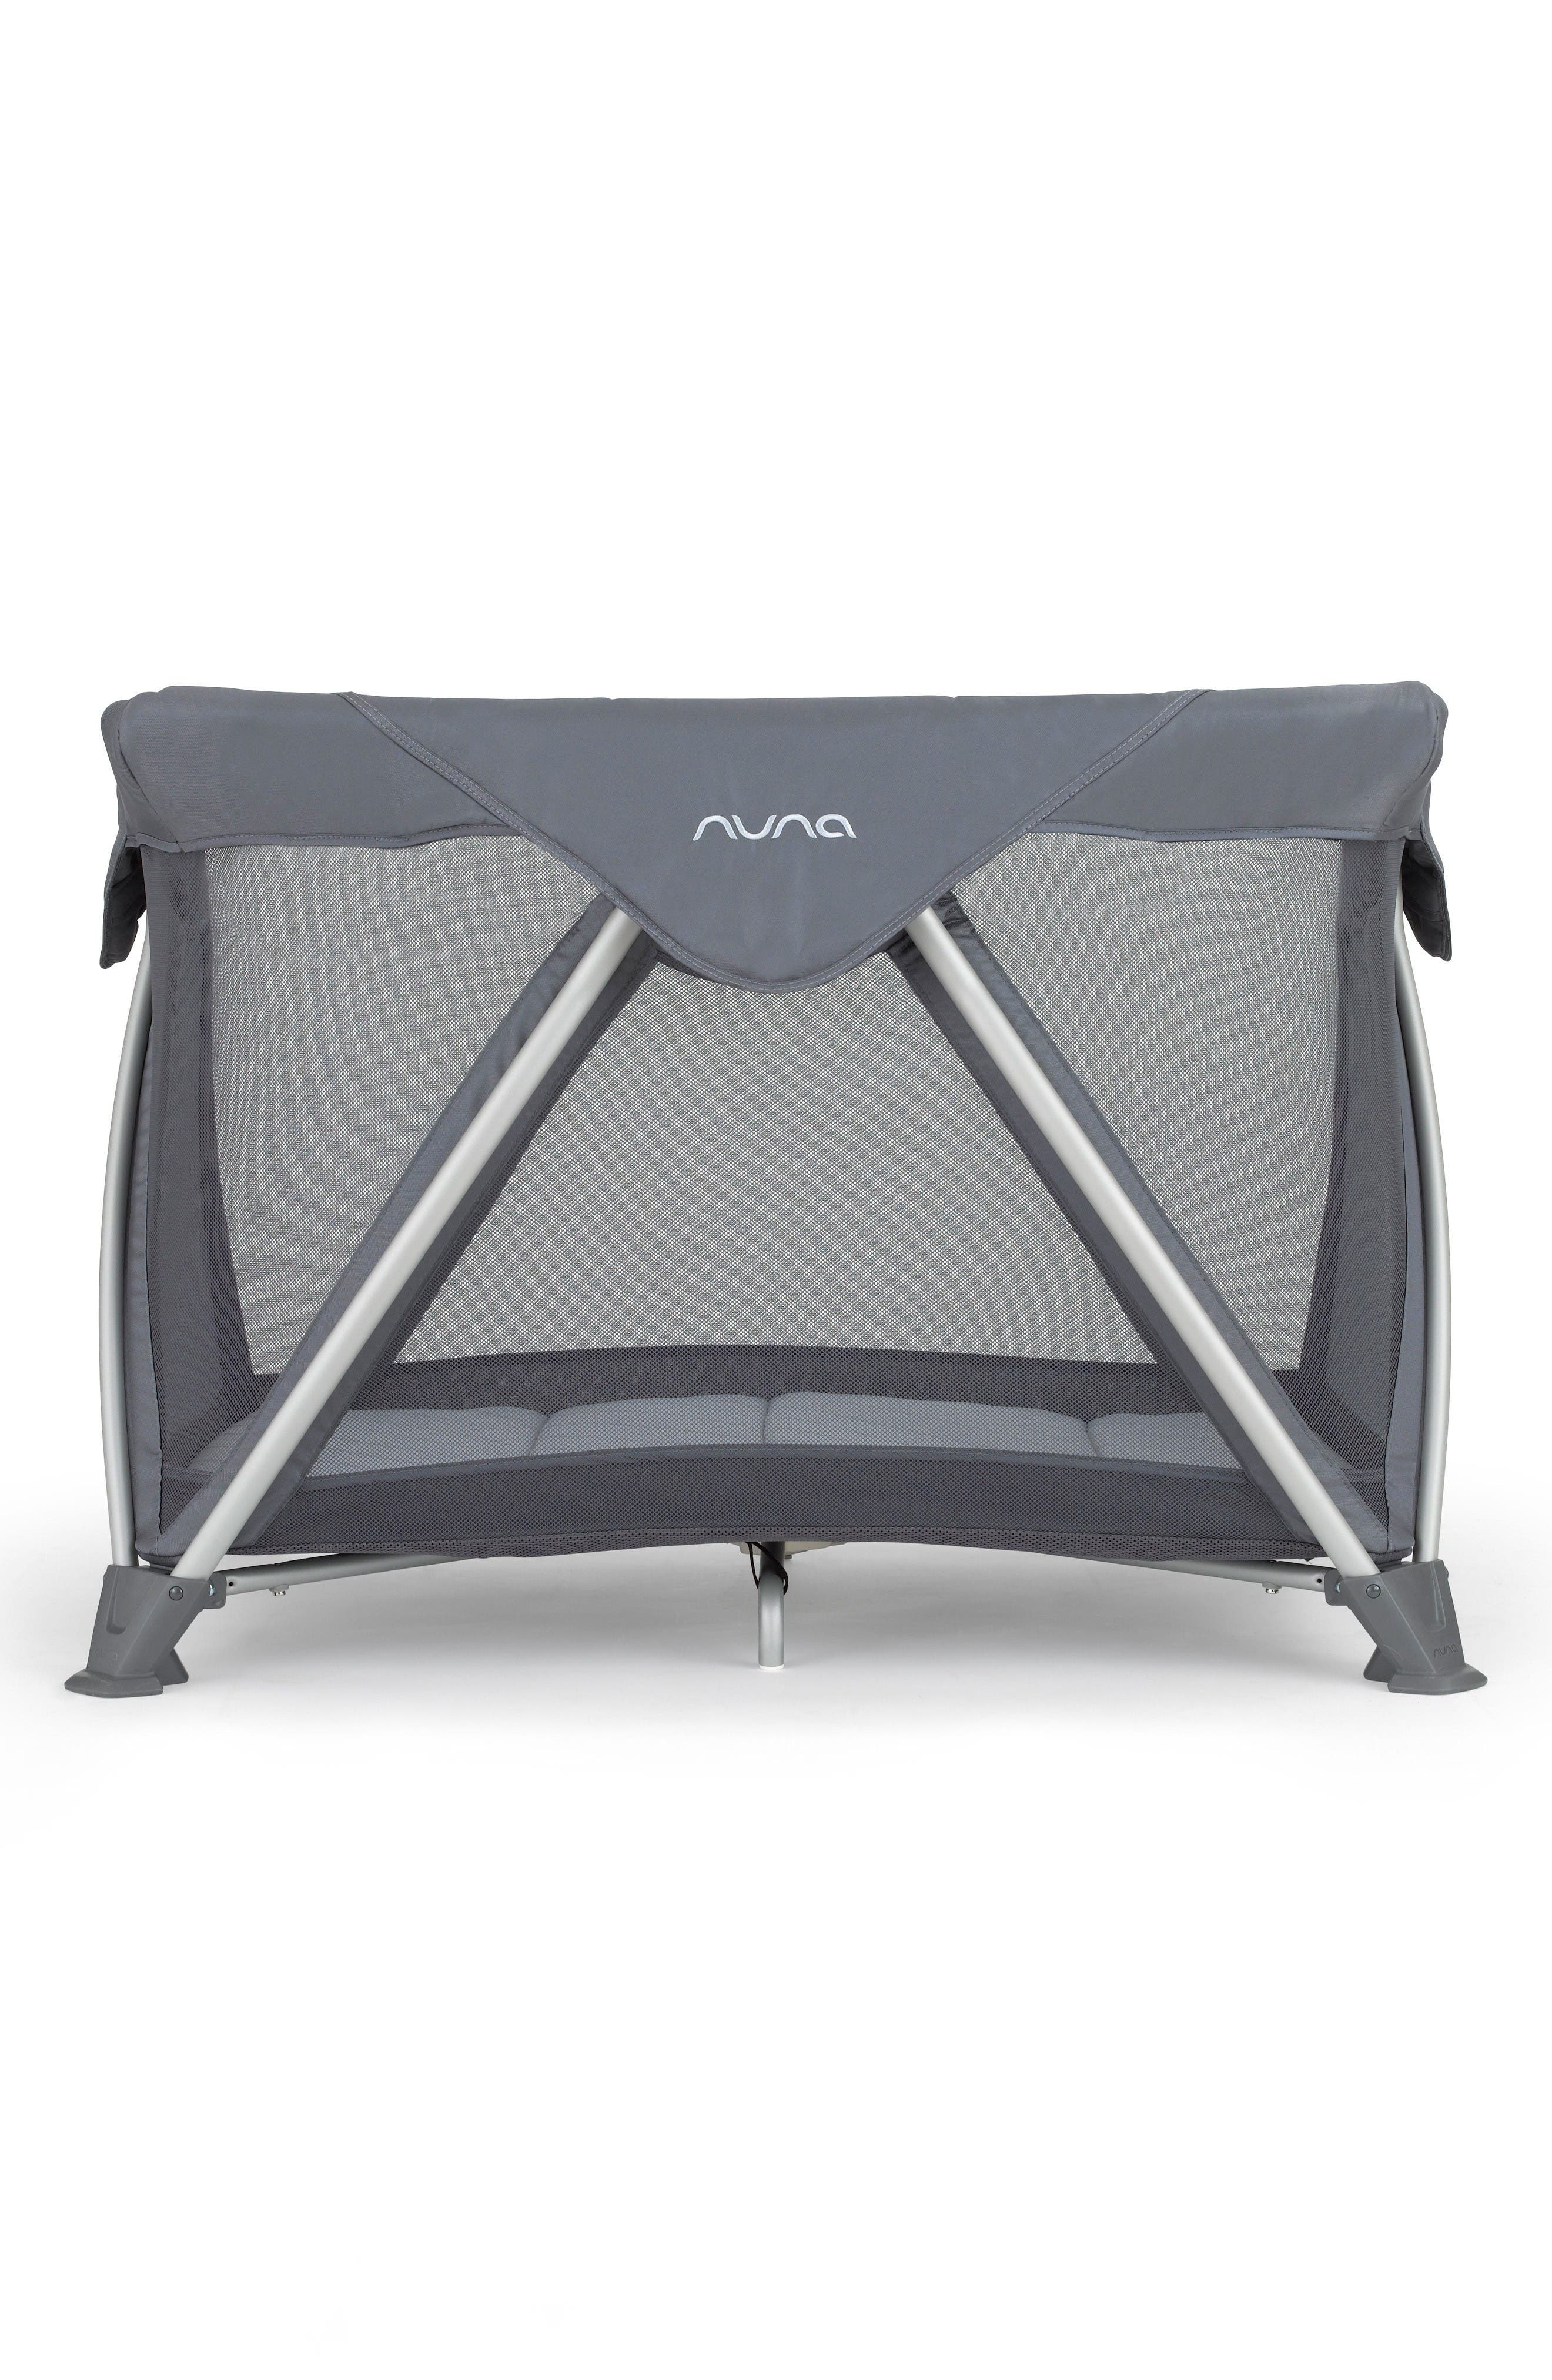 nuna SENA™ Aire Travel Crib